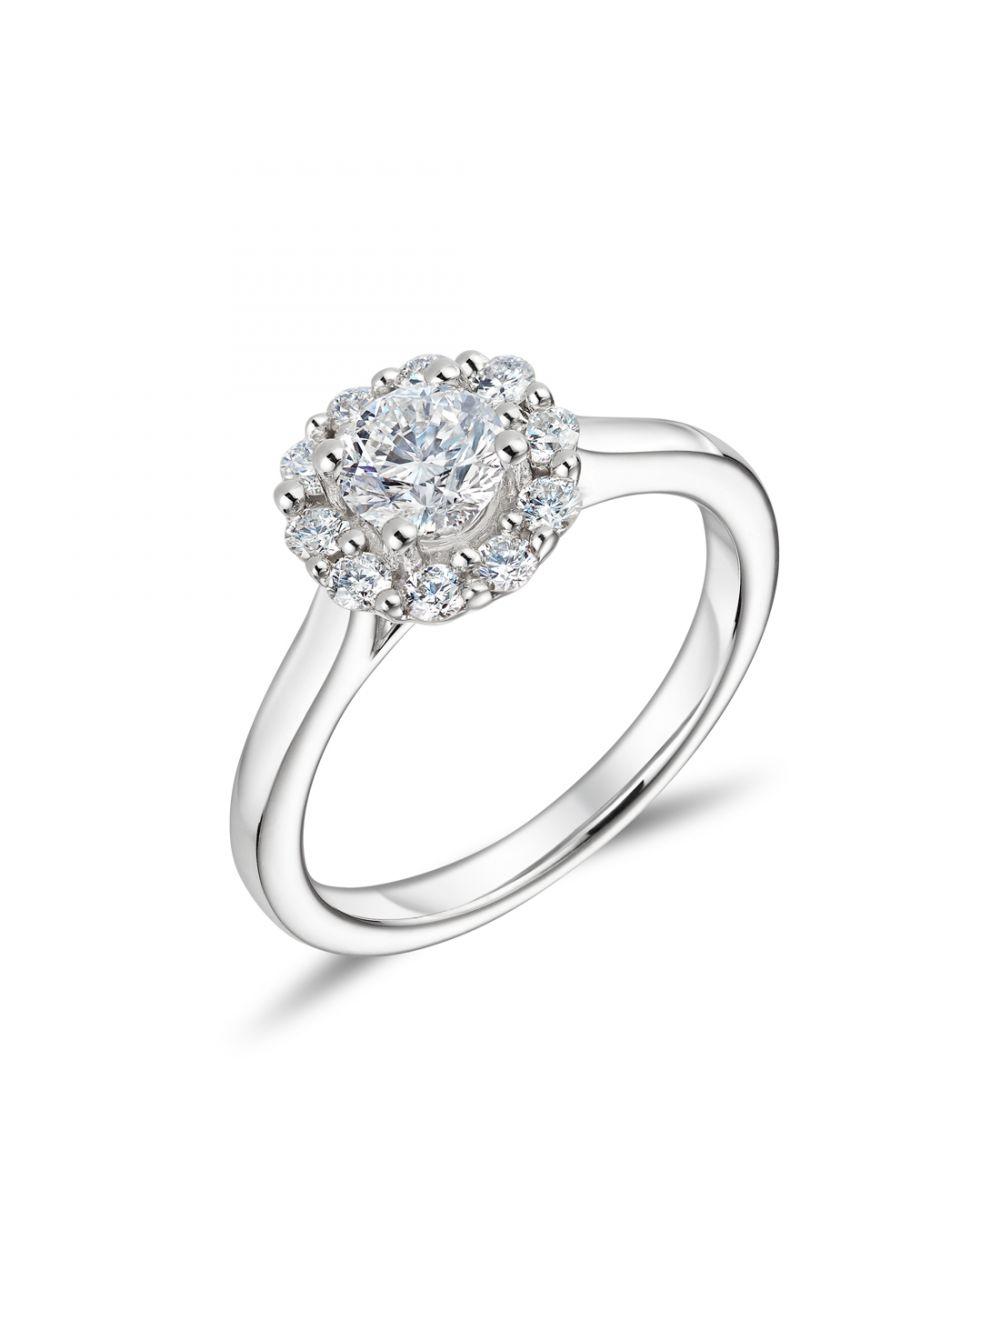 18ct Round Brilliant Cut Diamond Engagement Ring With Round Brilliant Diamond Engagement Rings (View 7 of 25)